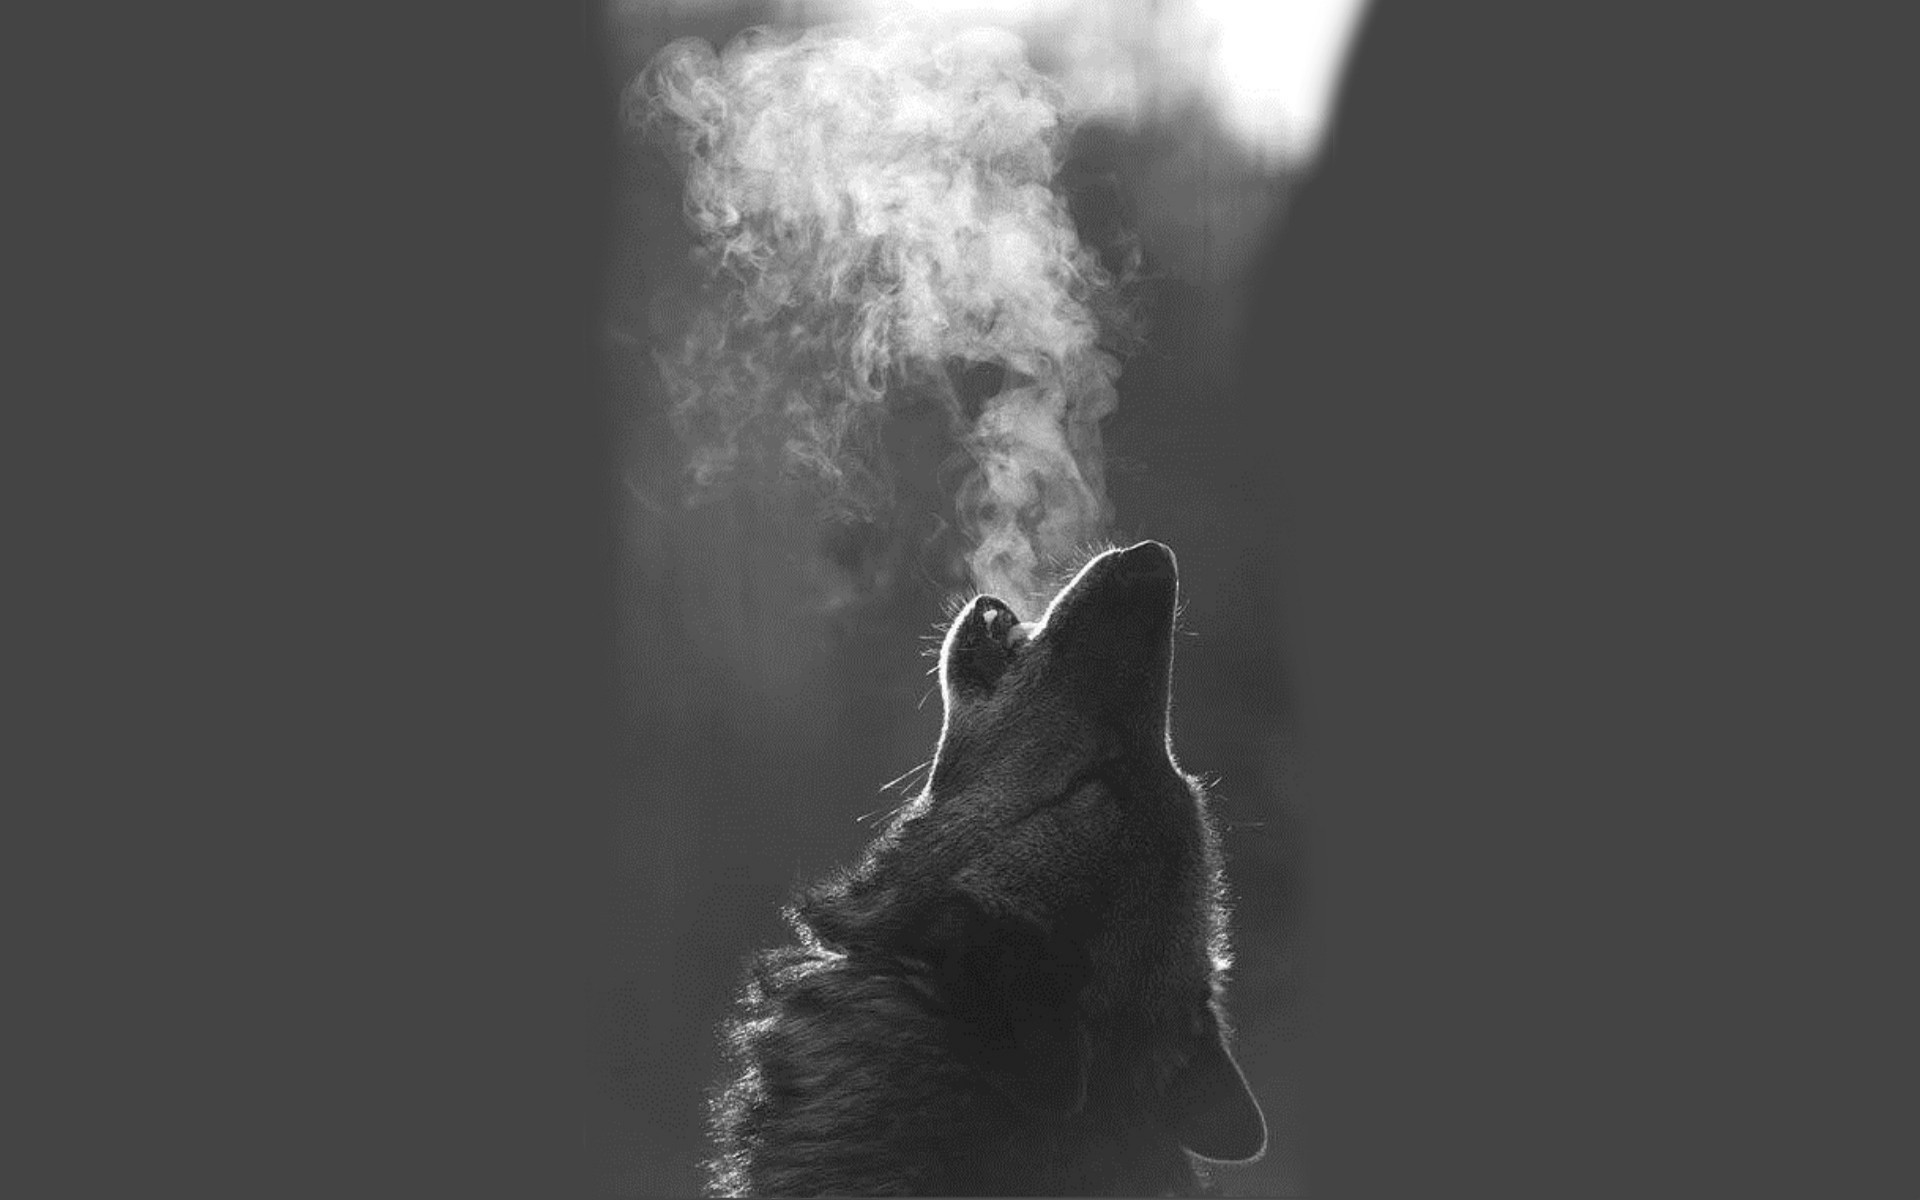 1920x1200 Monster Magical Animals Roar Fantasy Werewolf Howling Wolf Wallpaper 4k 1920x1200 Wallpaper Teahub Io